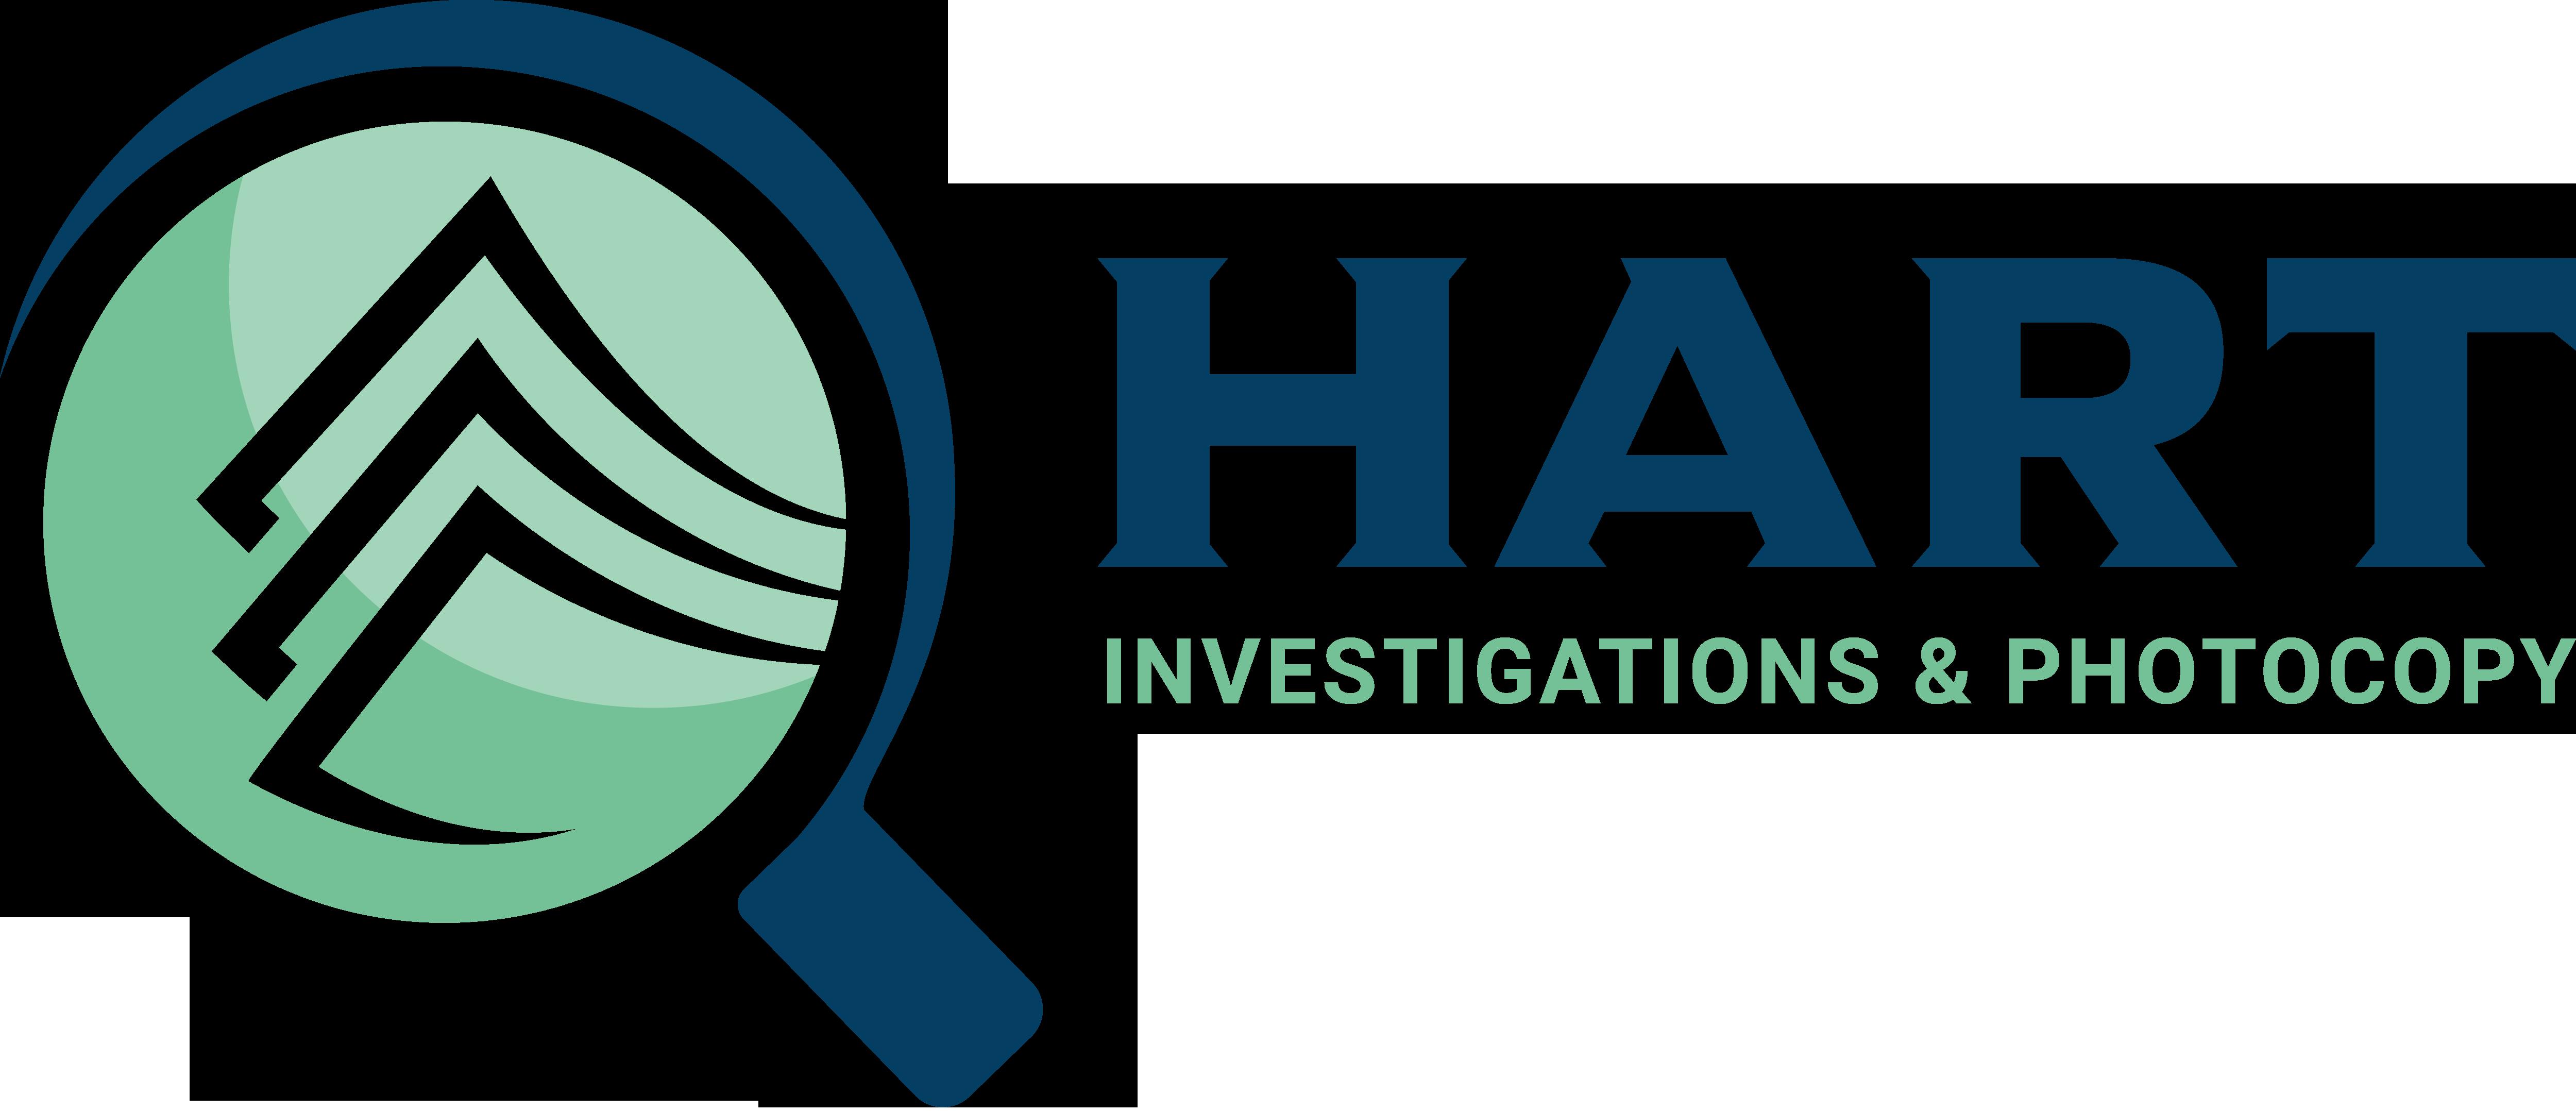 Hart Investigations & Photocopy